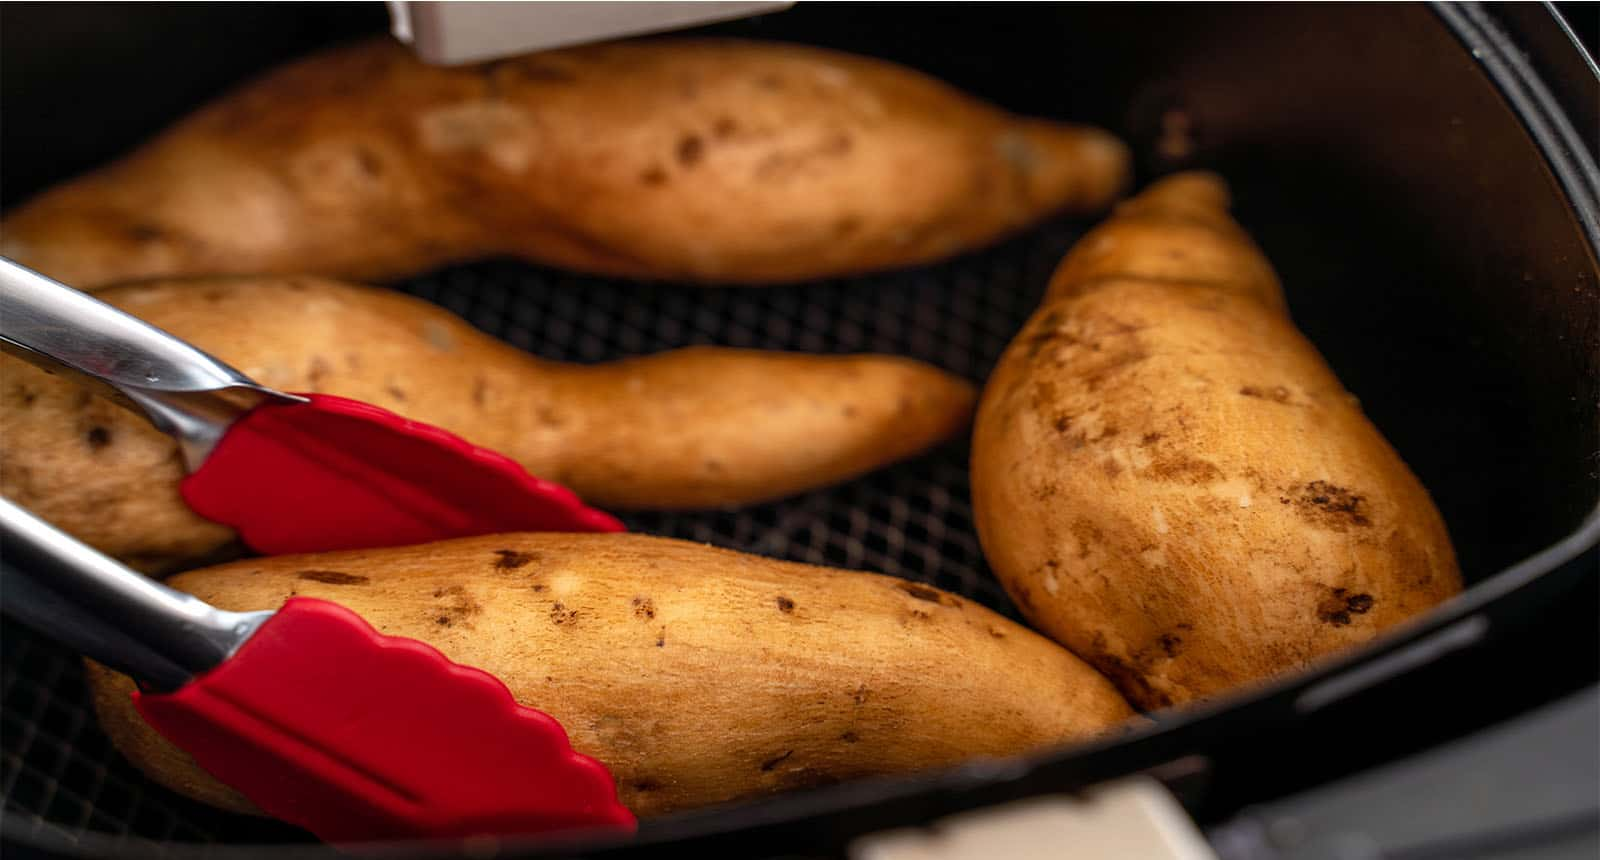 Roasted Sweet Potato Cooked